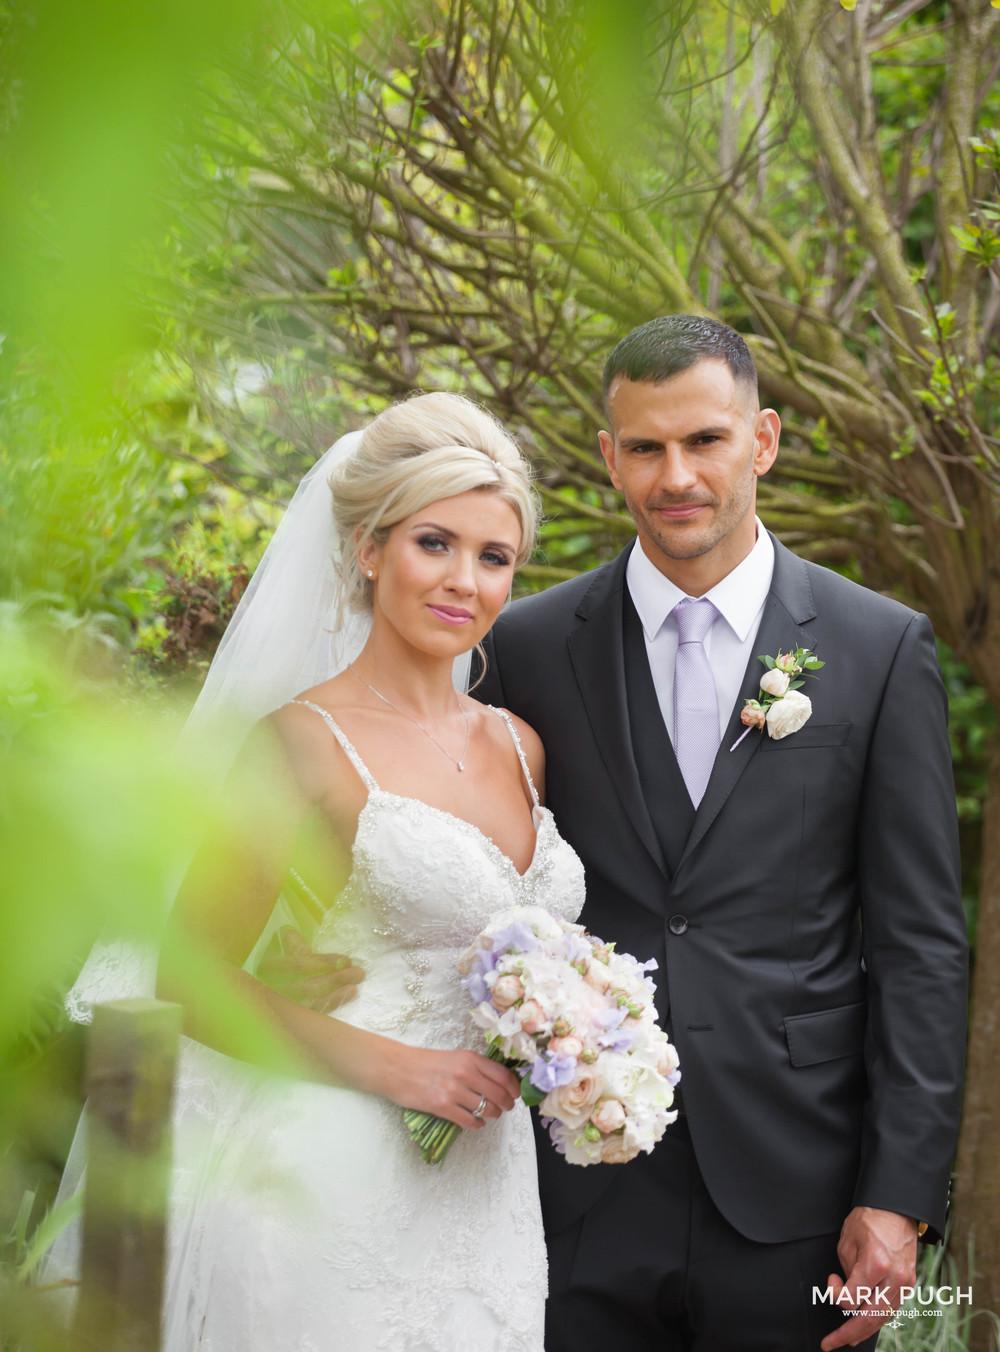 051 - Hannah and Michael - fineART wedding photography featuring Floral Media in Caunton, Newark NG23 6AQ by www.markpugh.com Mark Pugh_.JPG